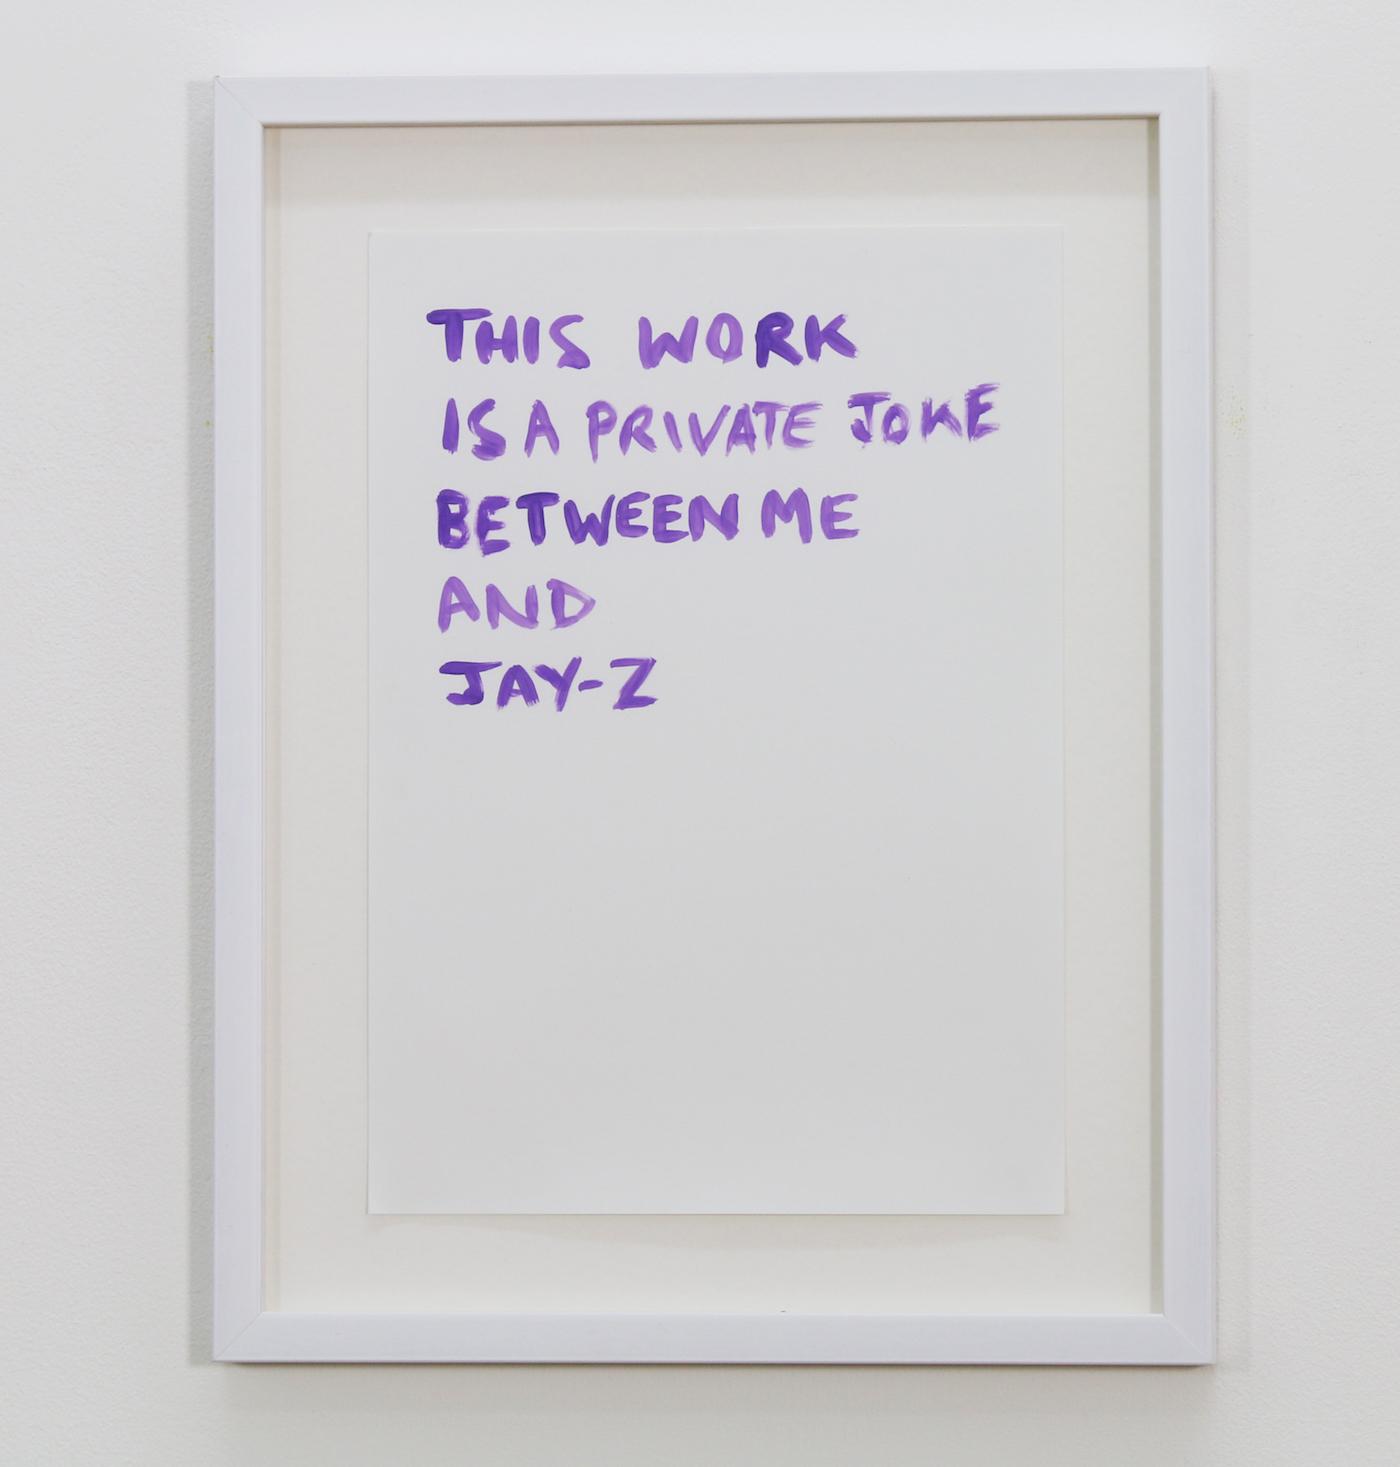 Tim Etchells, Private Joke (Jay-Z), 2014. Purple acrylic on archival paper. Framed. 29.7 x 21 cm.